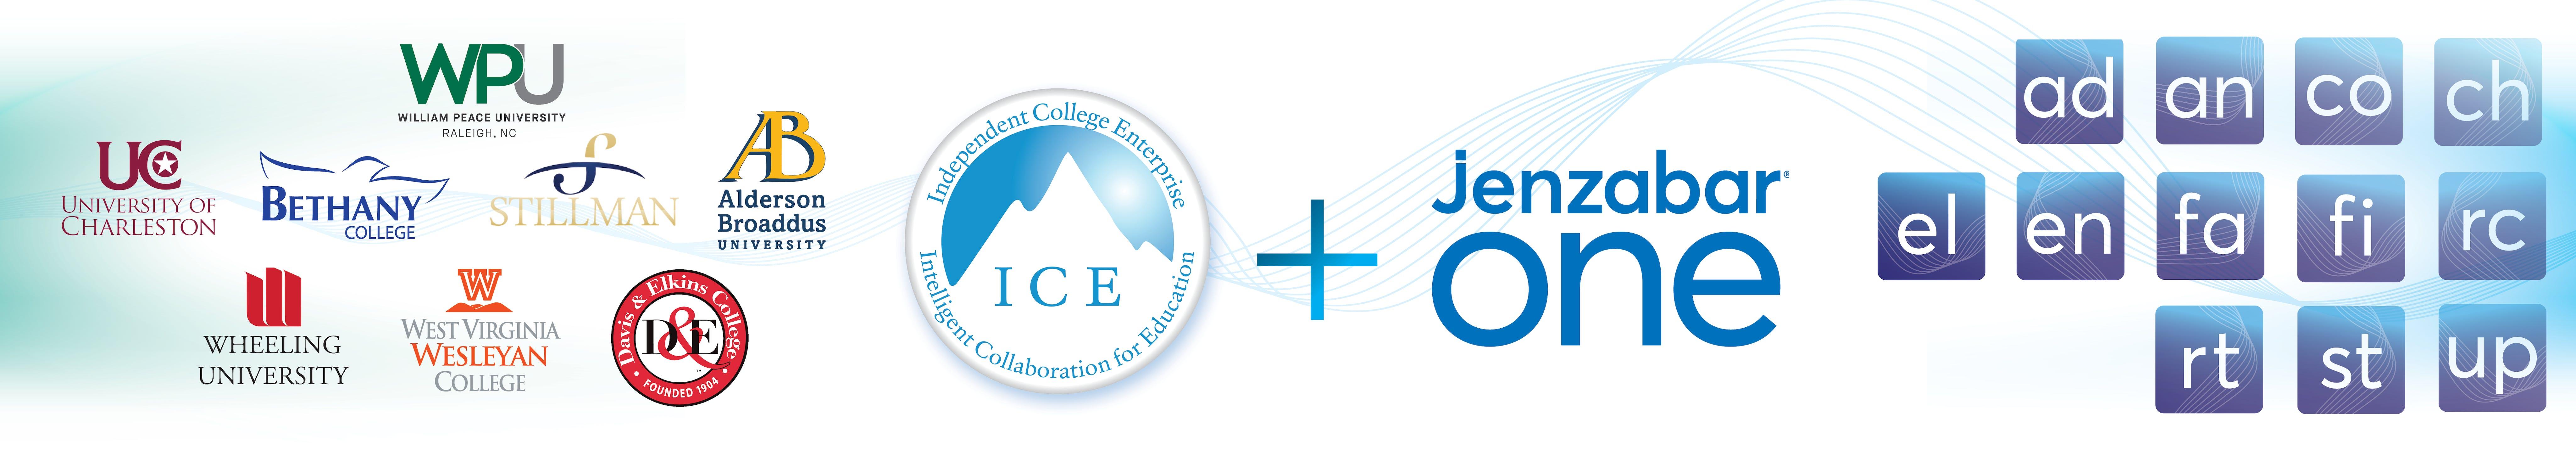 Jenzabar and ICE